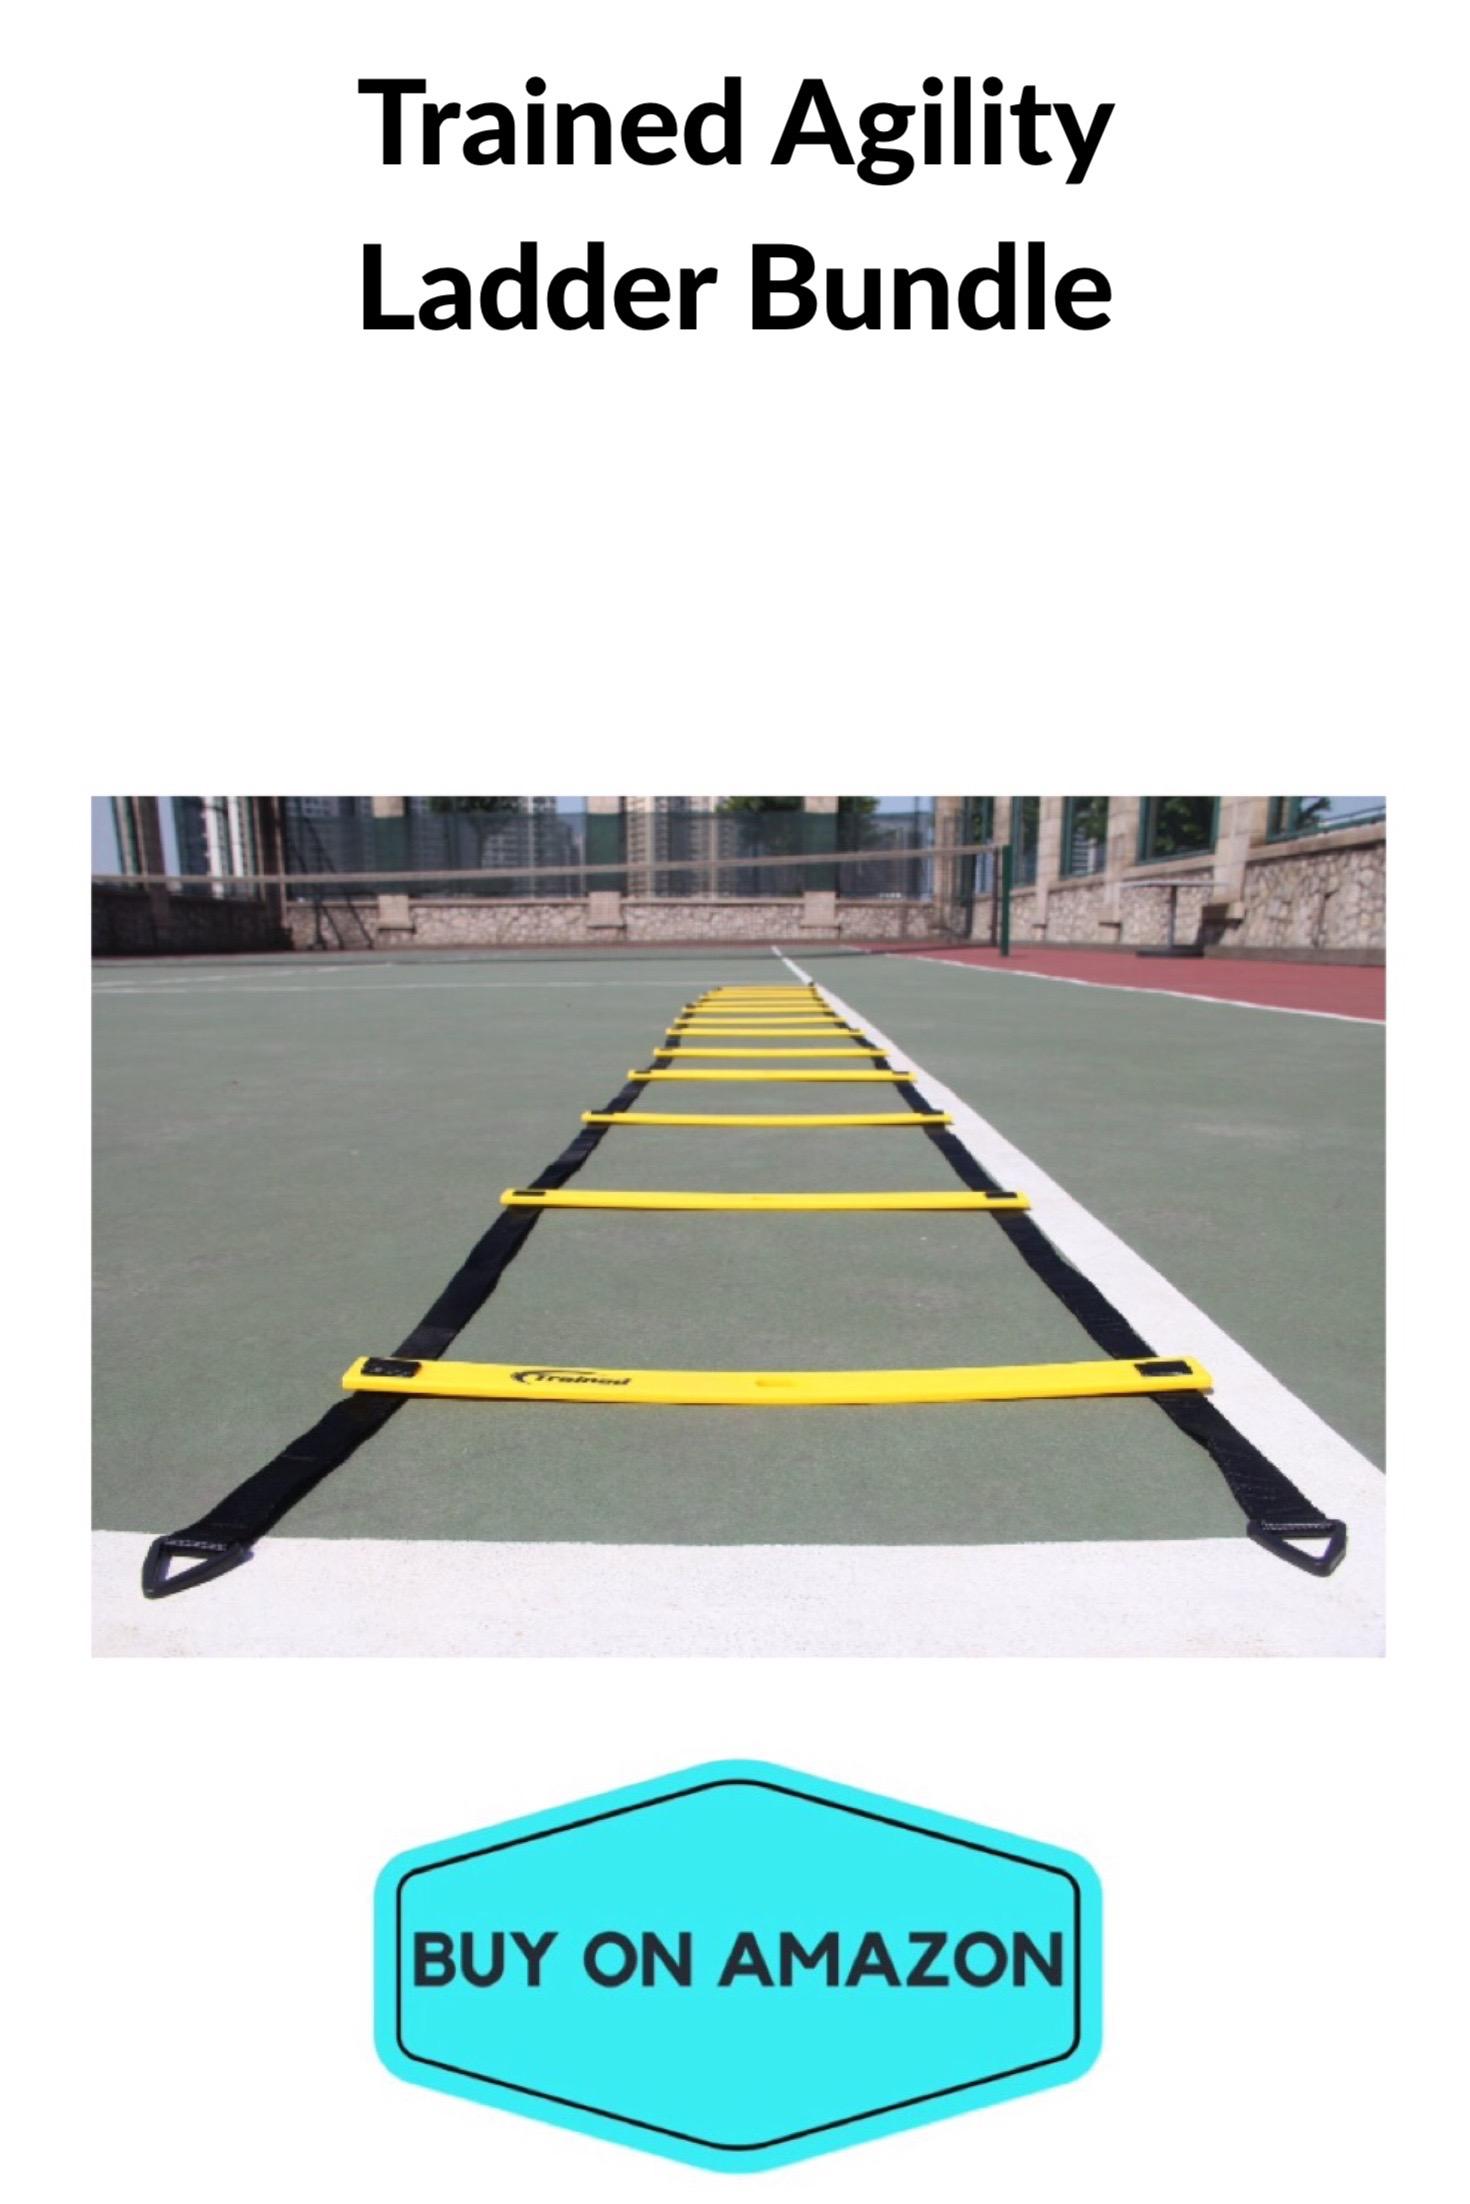 Trained Agility Ladder Bundle